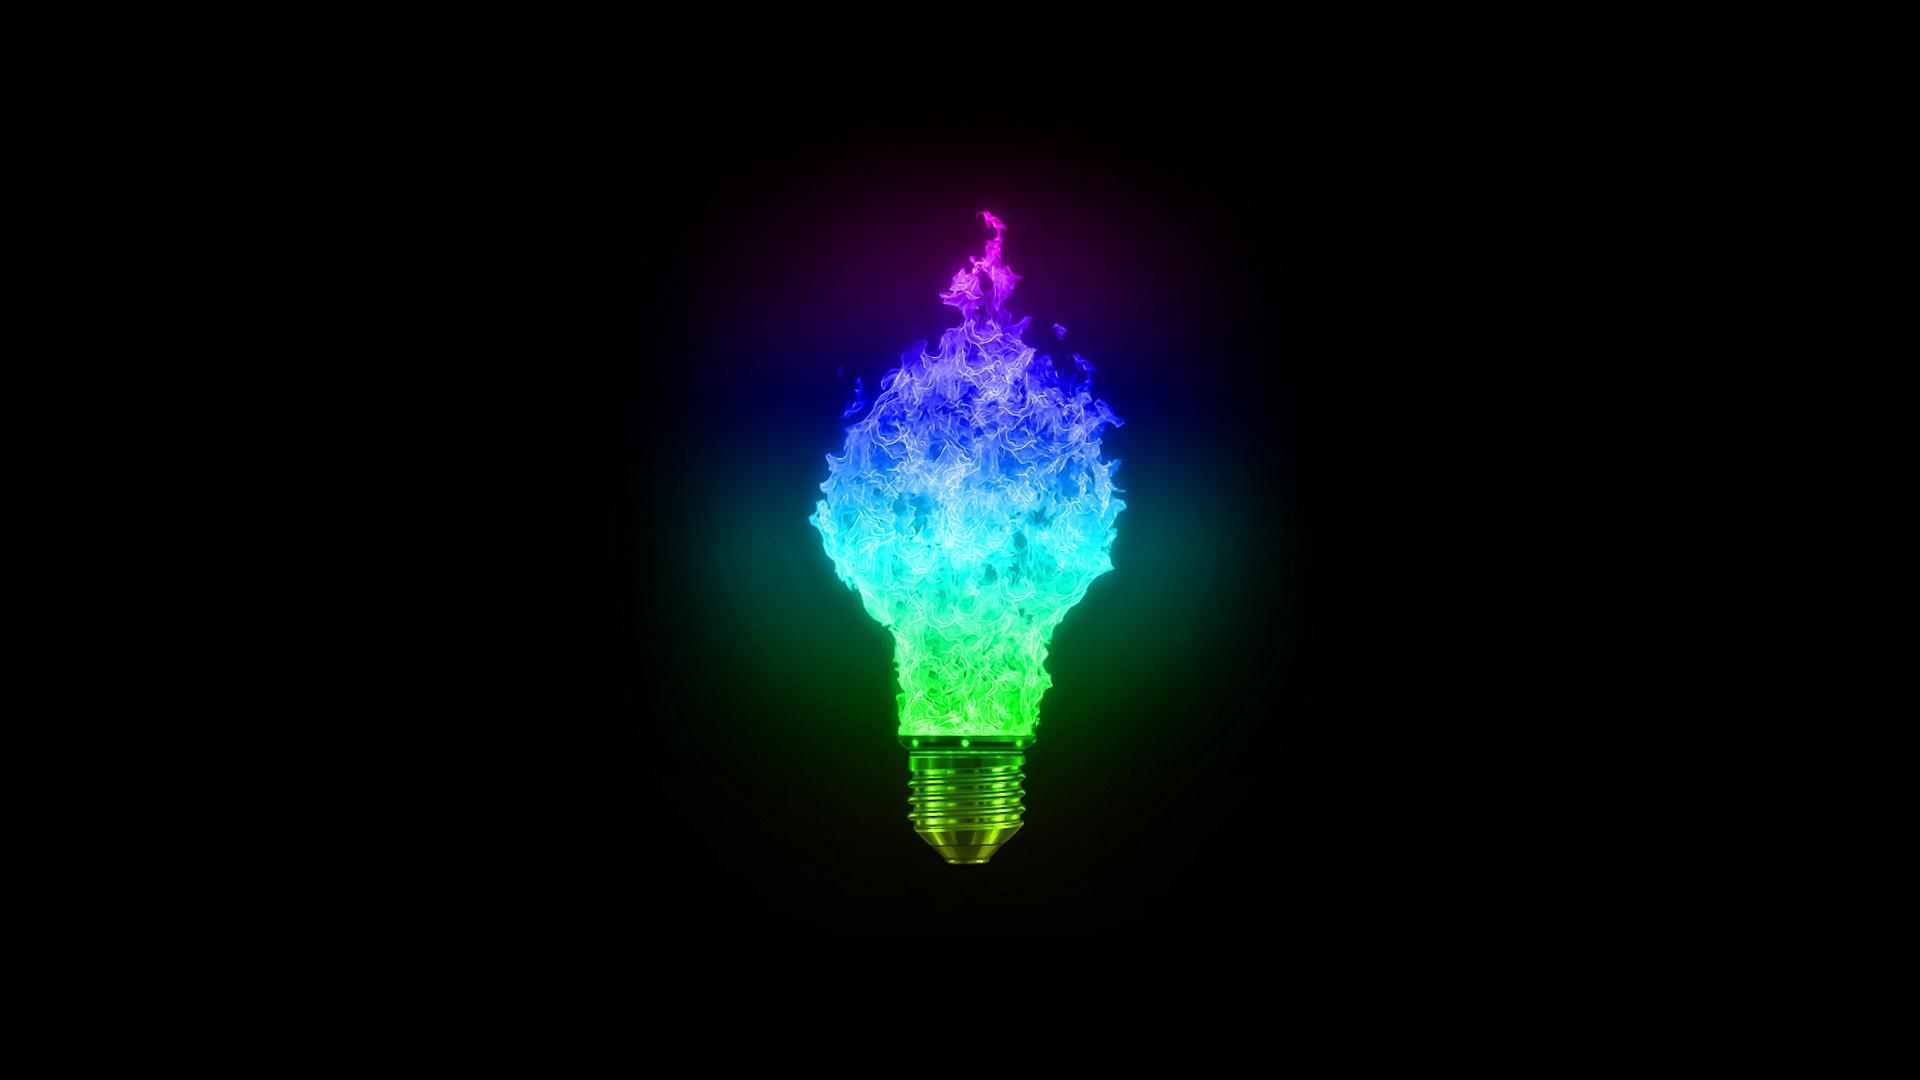 Лампа  № 2634874 без смс